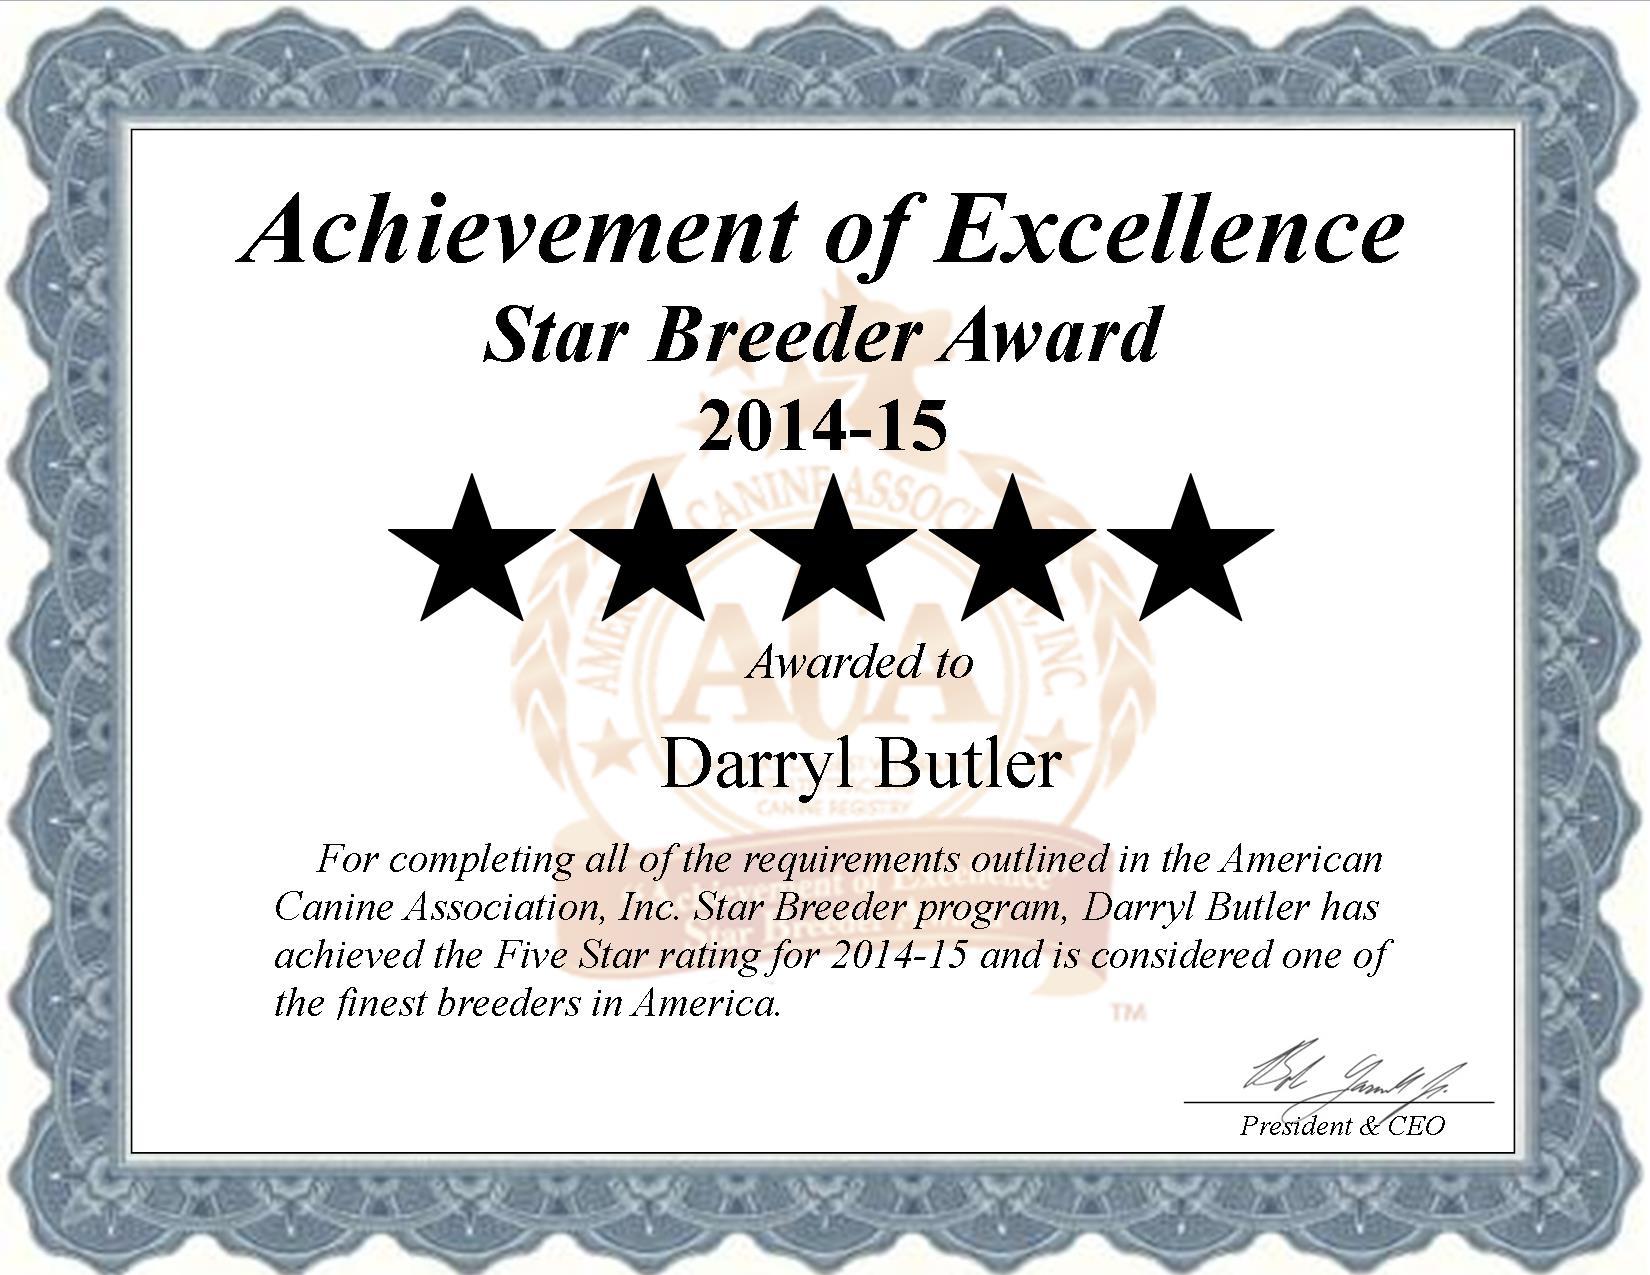 Darryl Butler, Butler, Darryl, Kennel, starbreeder, star breeder, 5 star, USDA, Lancaster, Lancaster County, pet, PA, Pennsylvania, Harrisburg PA, Harrisburg, Doglaw, dog law, dog, puppy, puppies, ACA